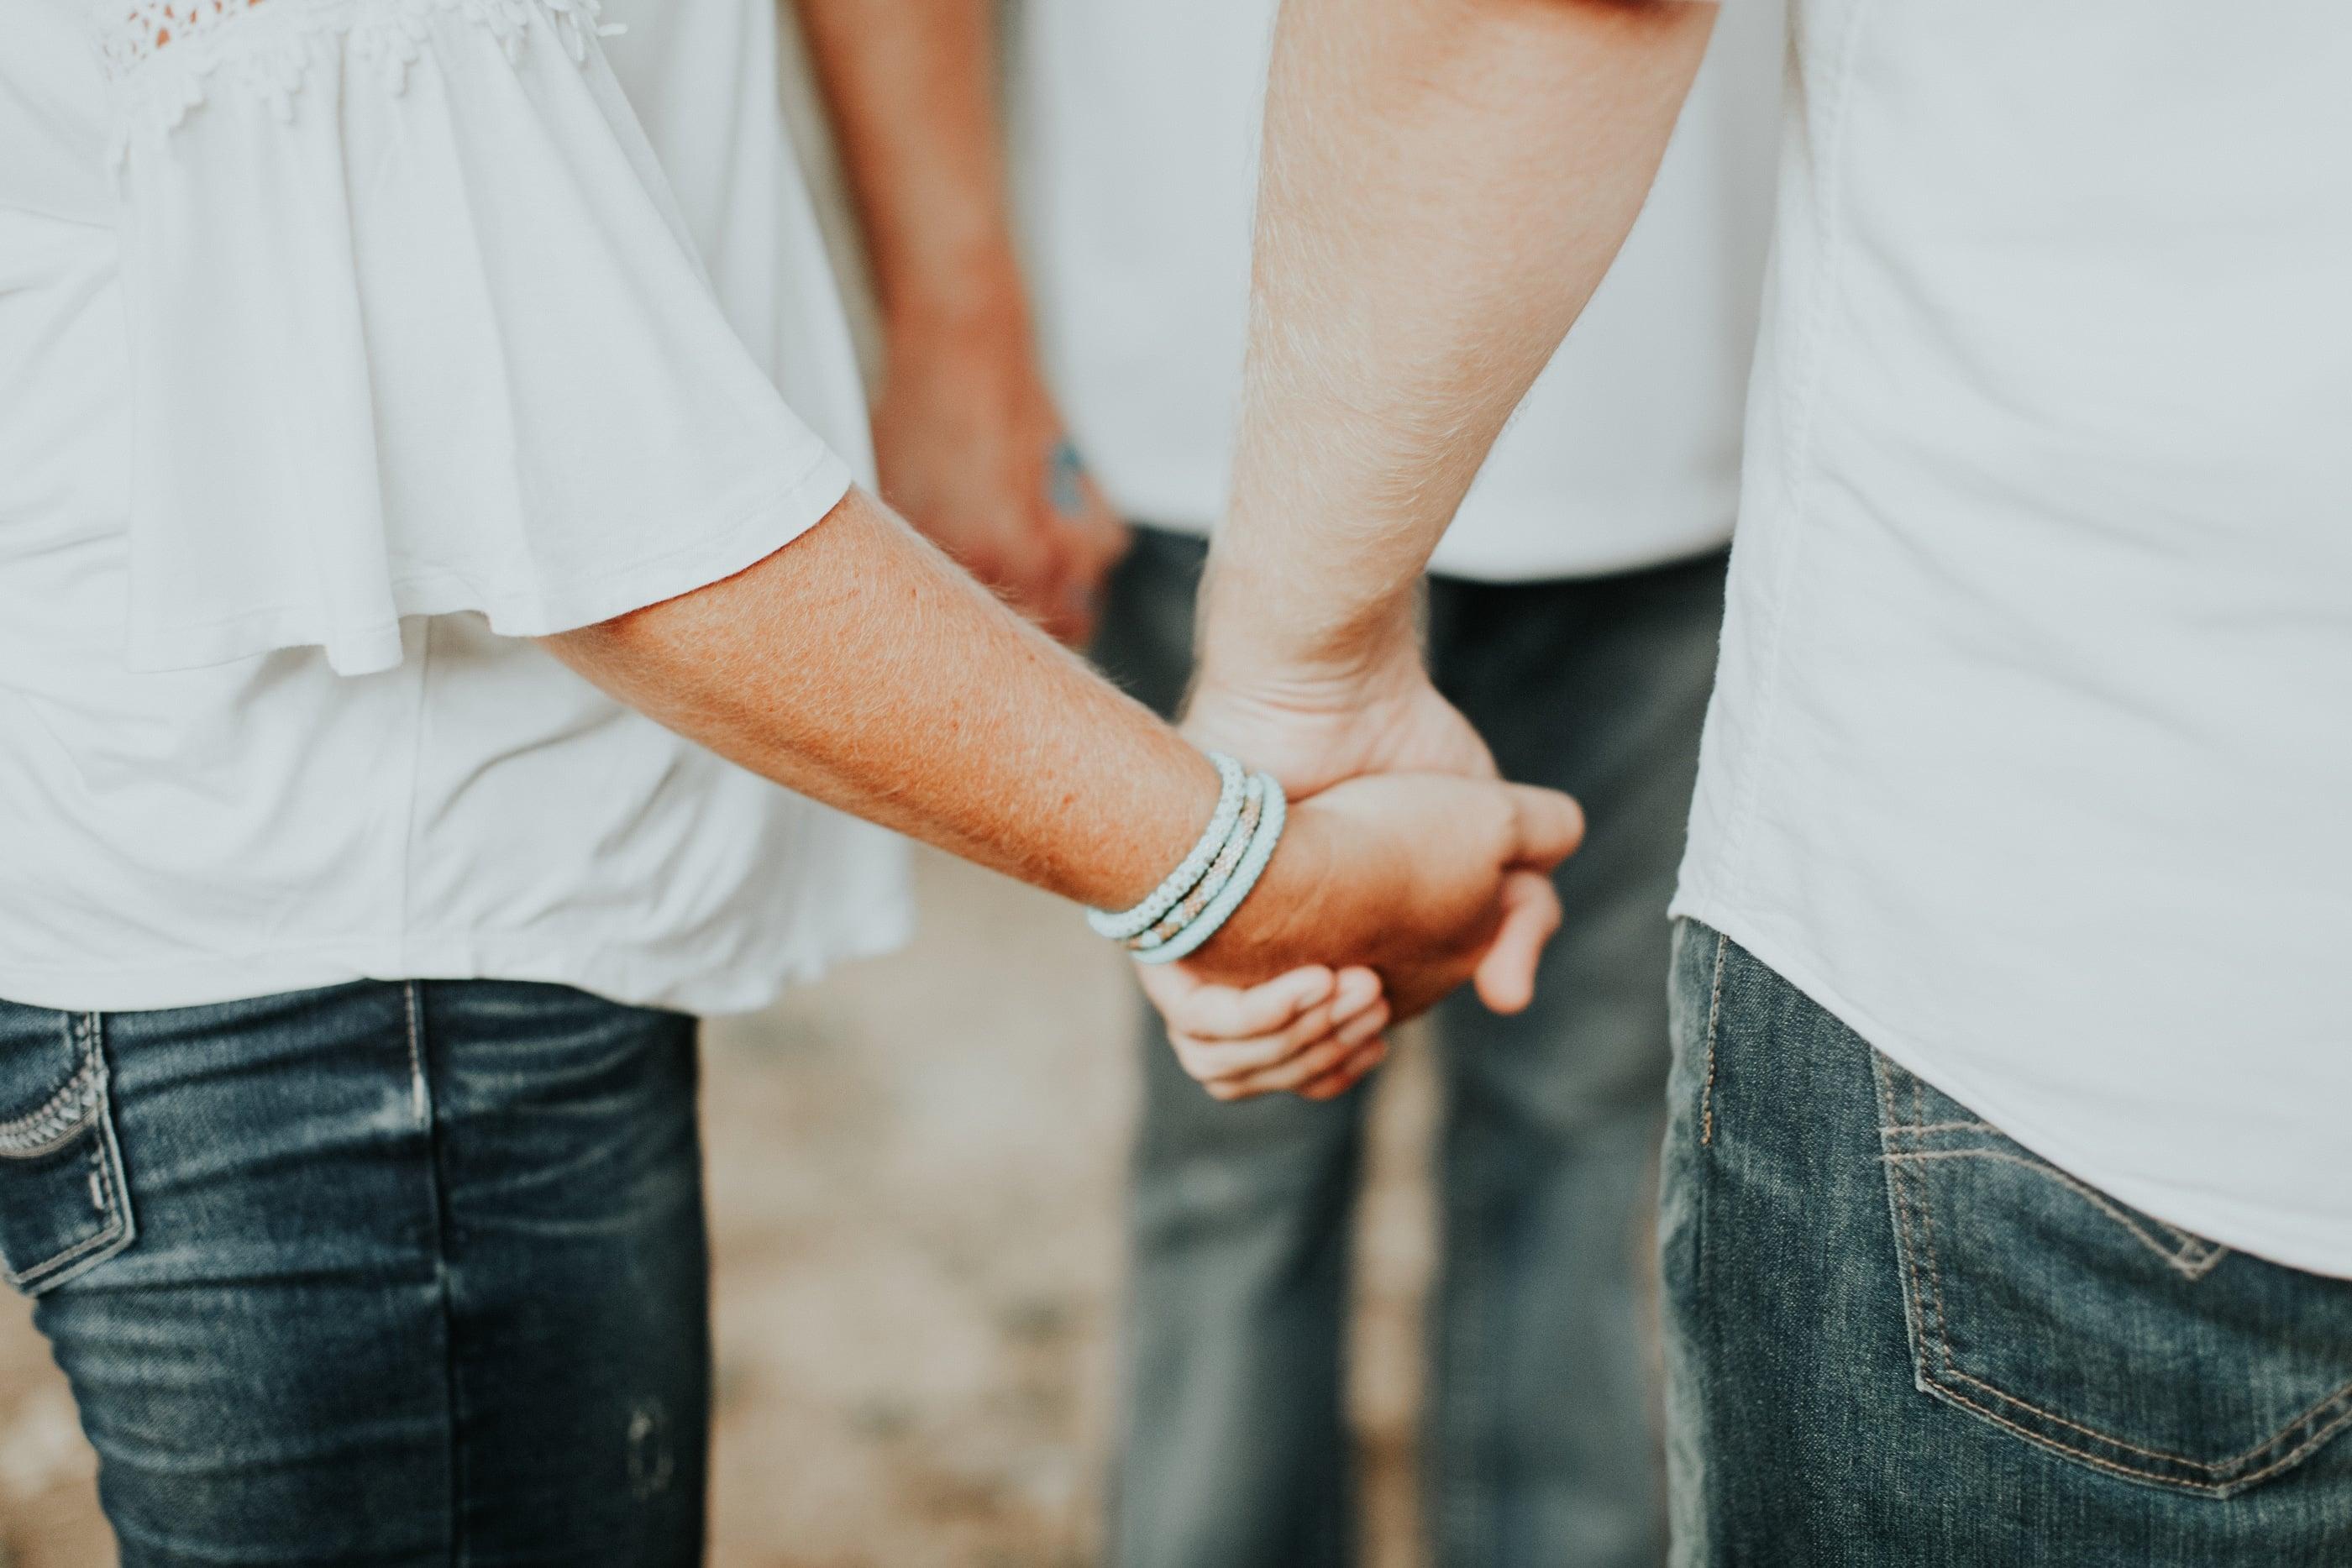 É pecado fazer sexo durante o noivado?